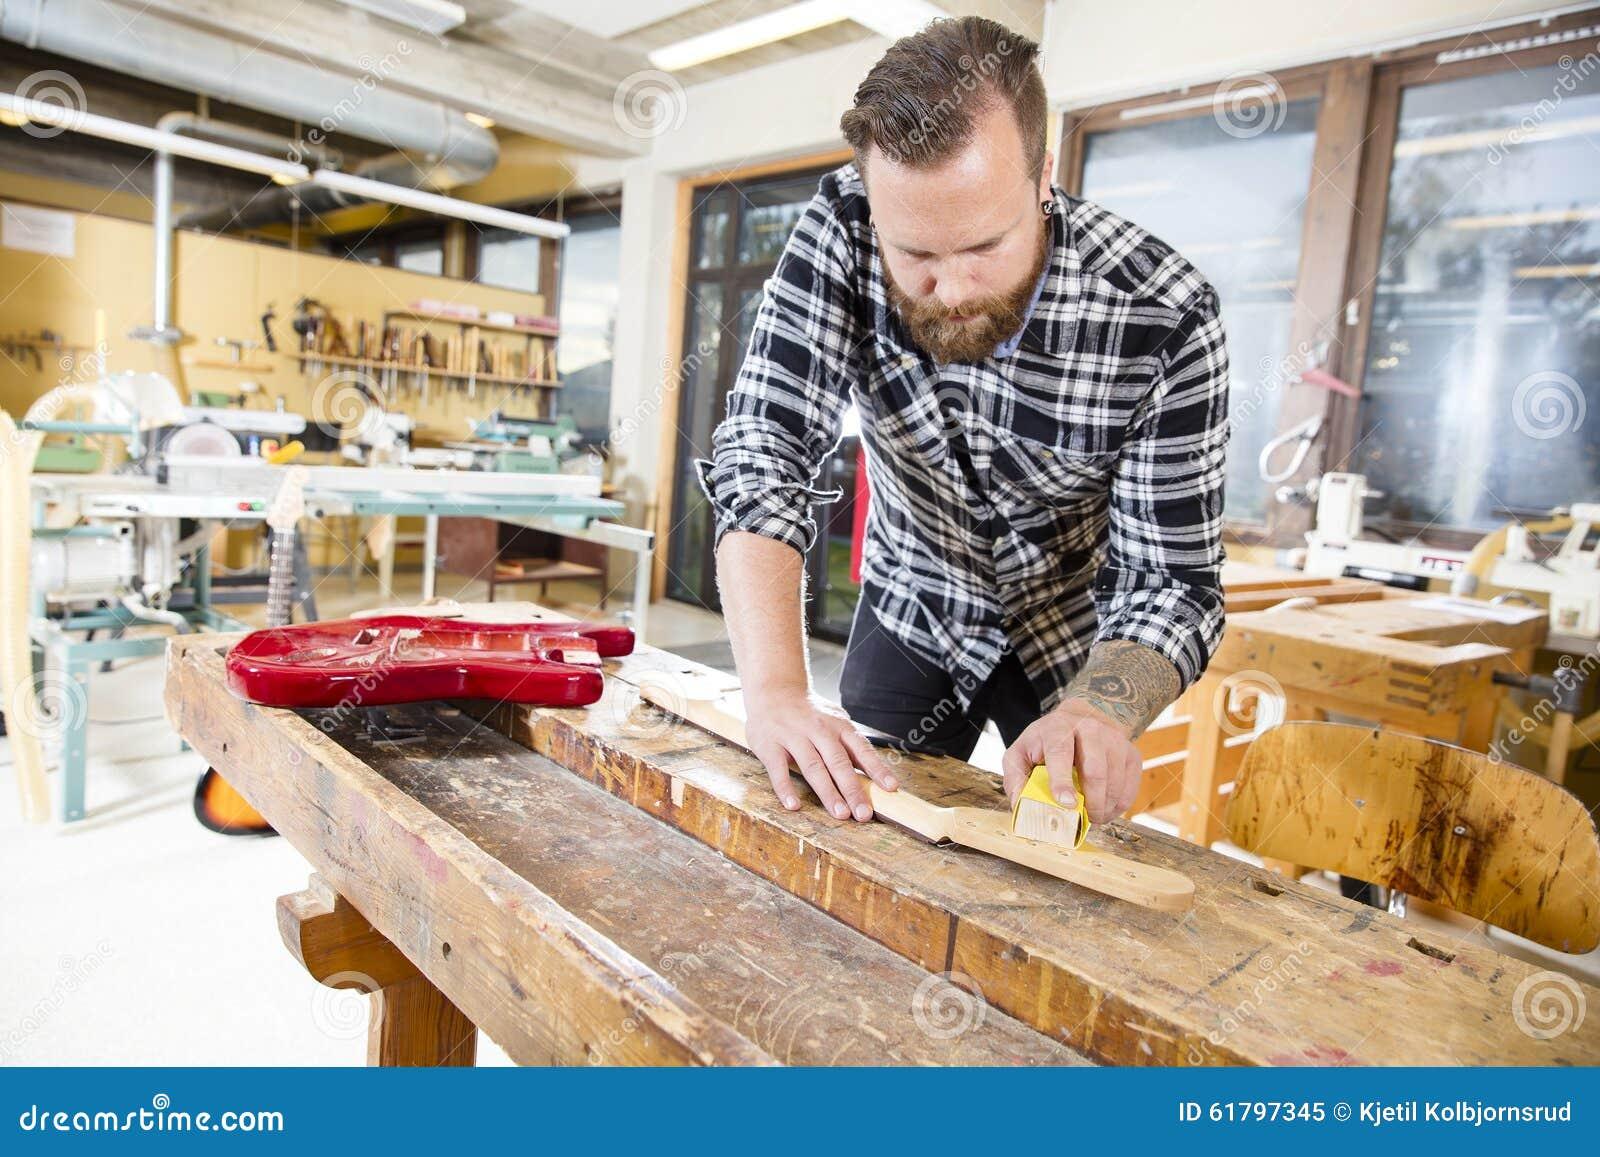 Carpenter sanding a wooden guitar neck in workshop stock for Working man tattoo